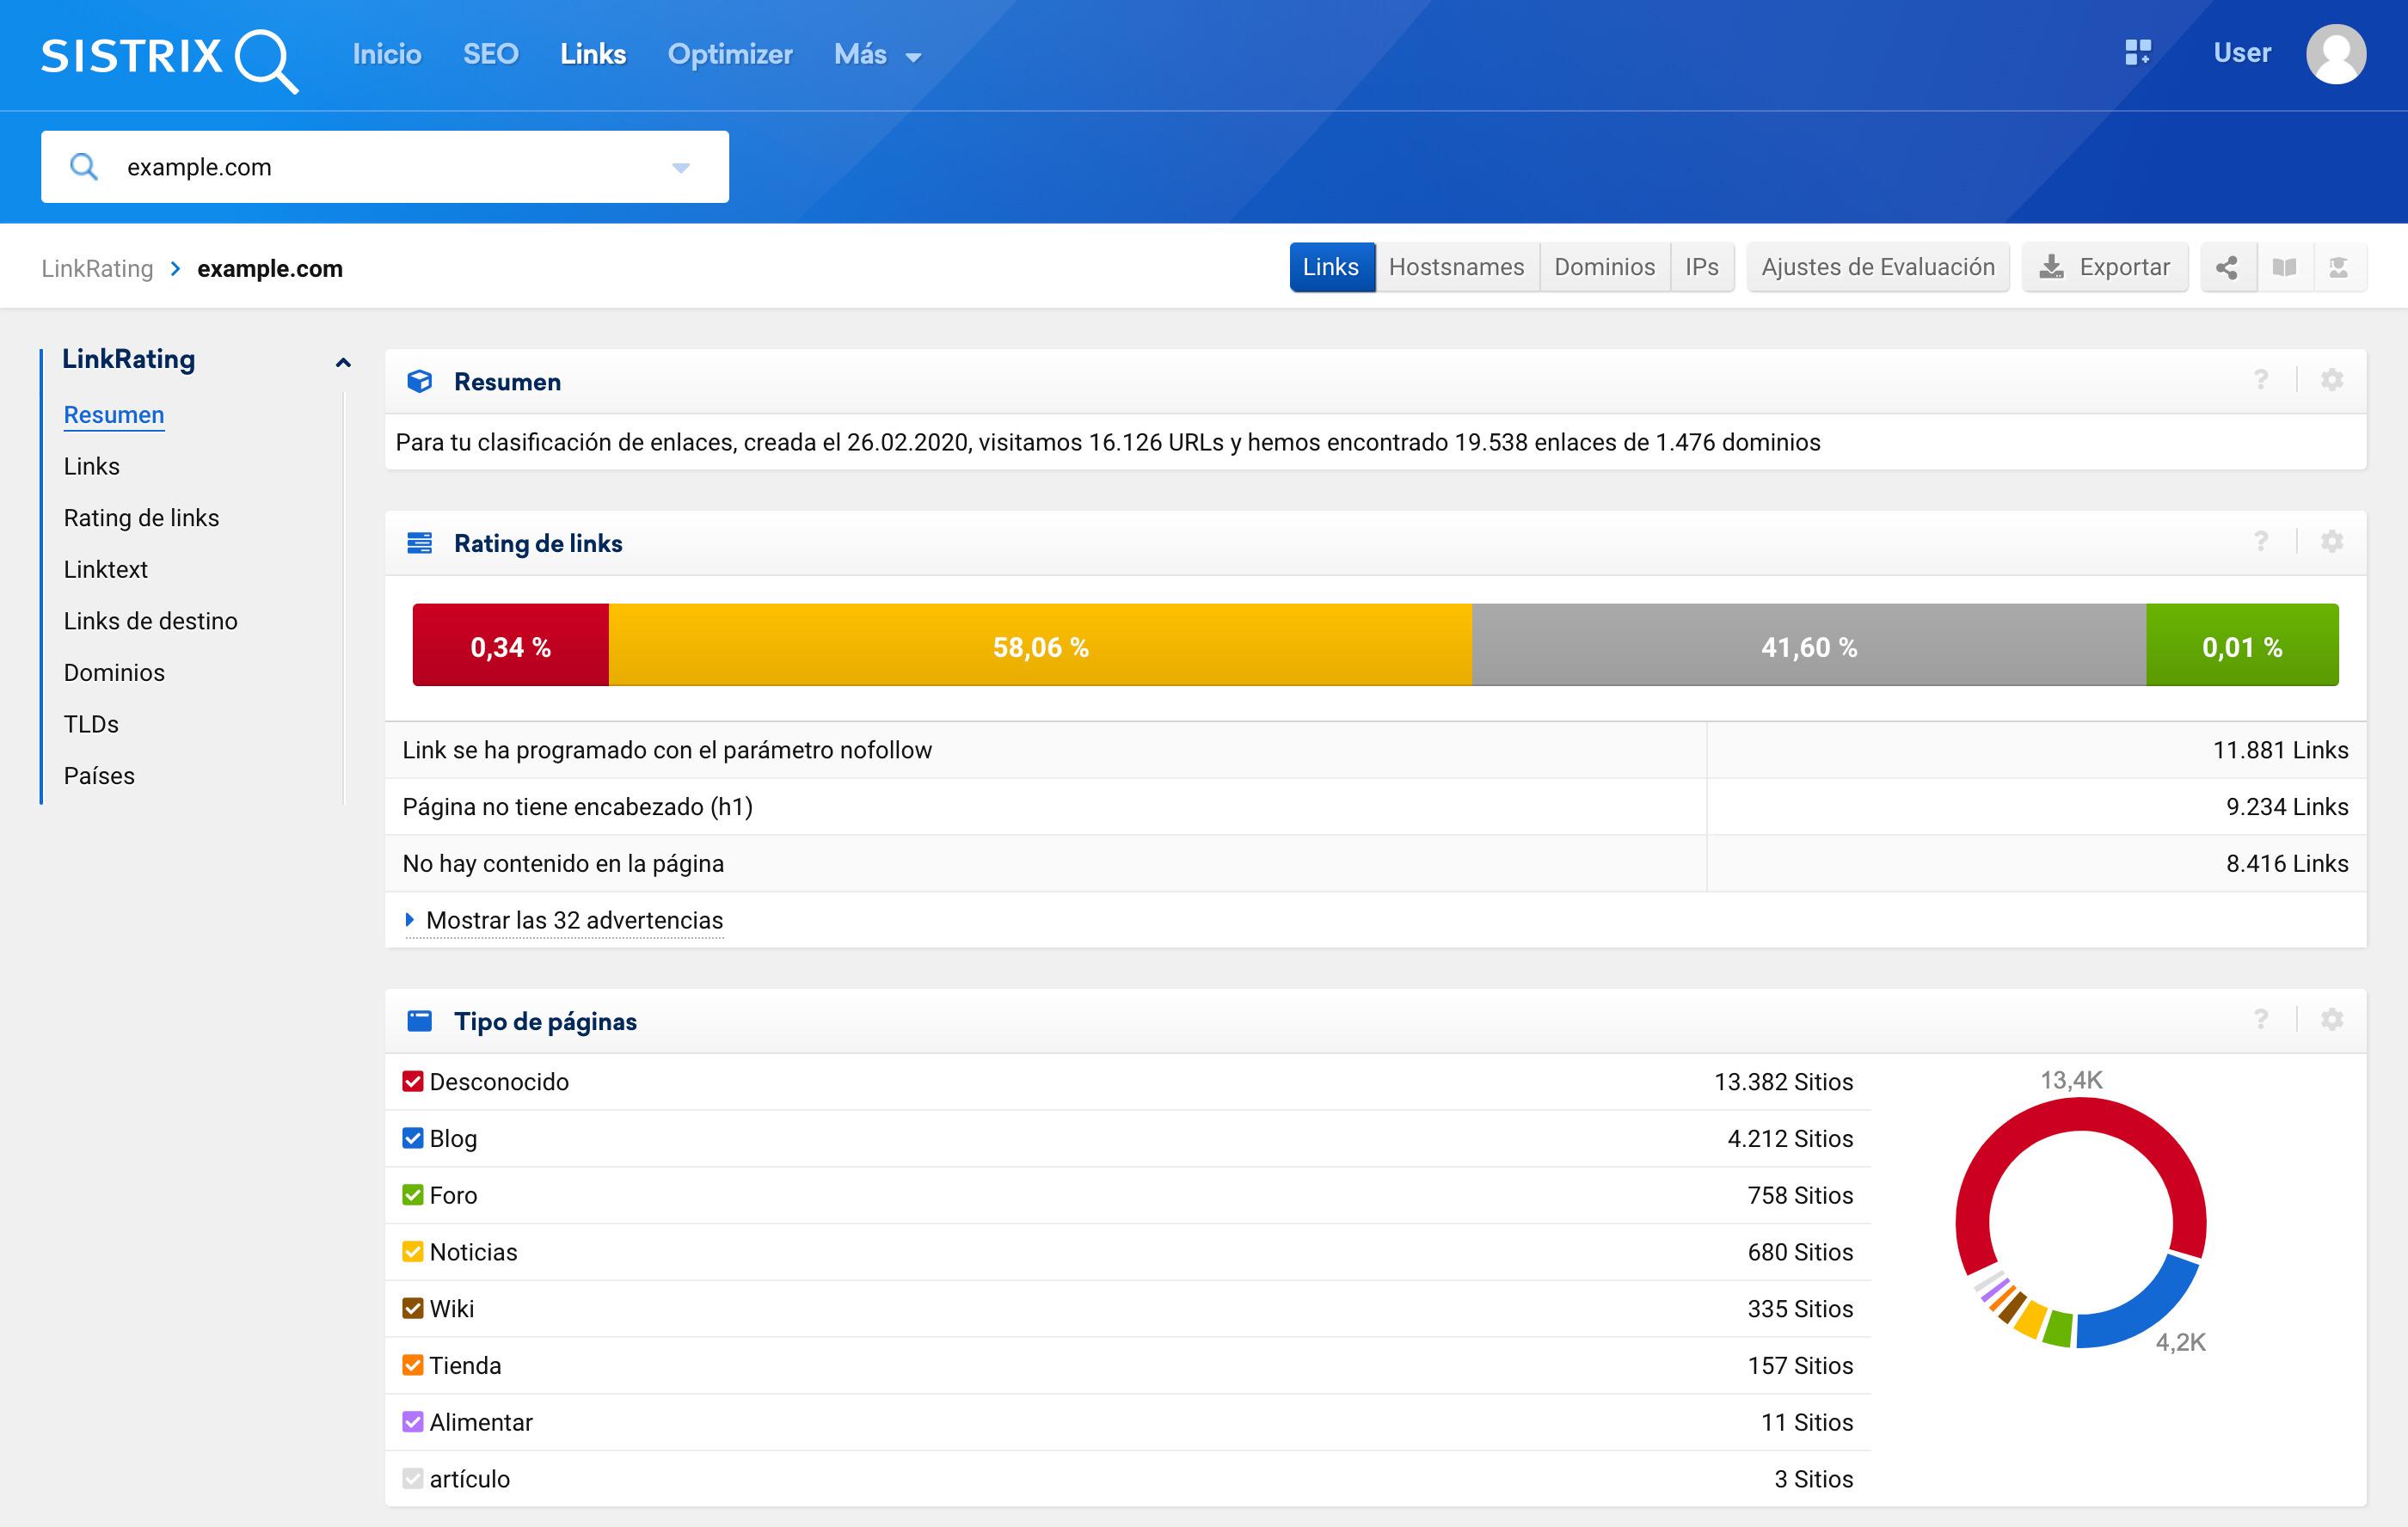 LinkRating Dashboard auf sistrix.de: Beispiel kreuzfahrt.de